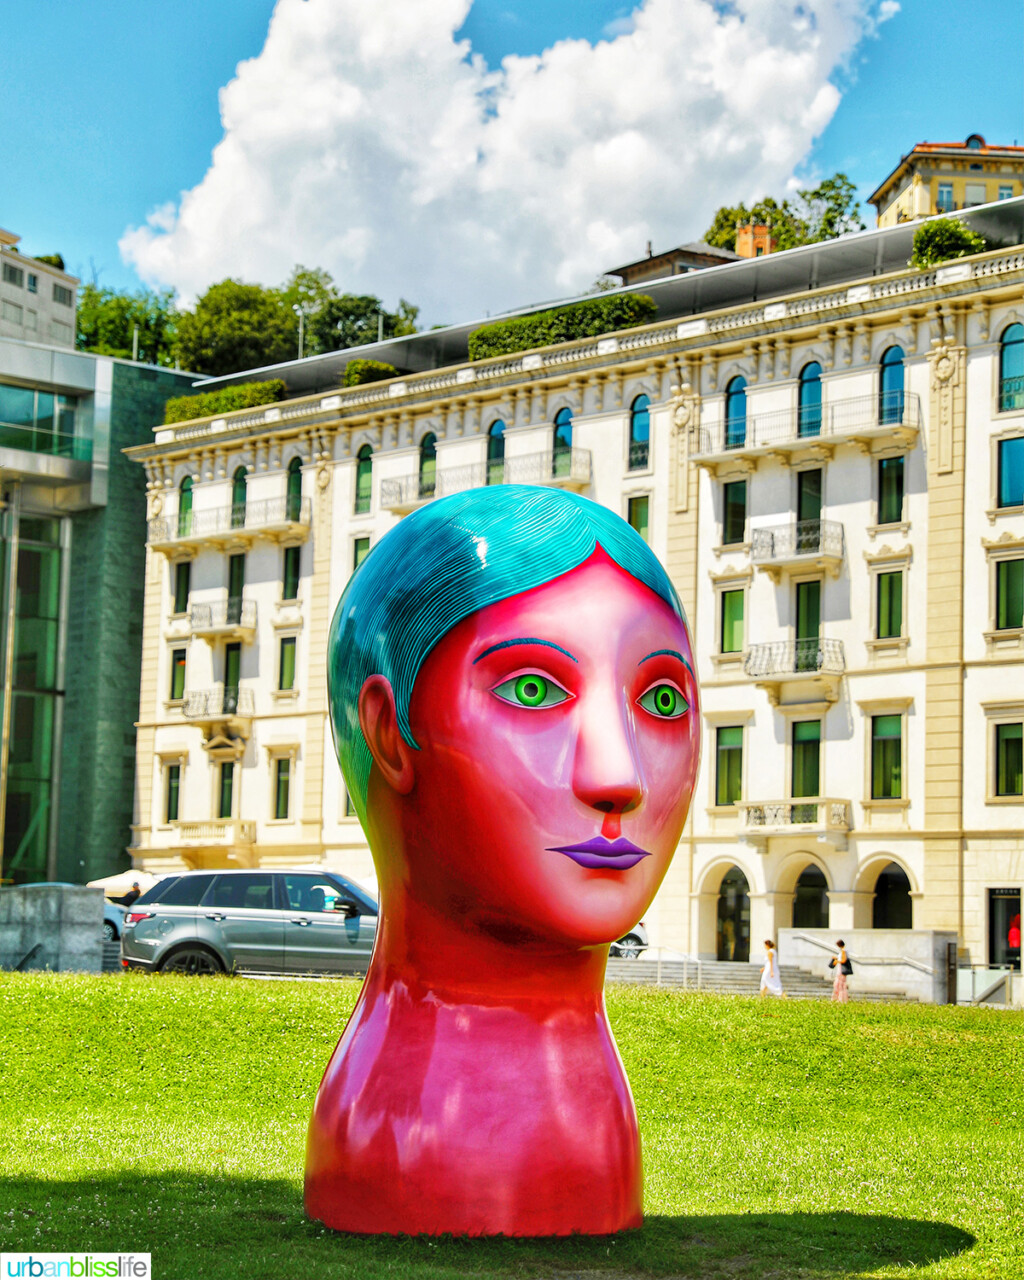 colorful art sculpture in Lugano Switzerland